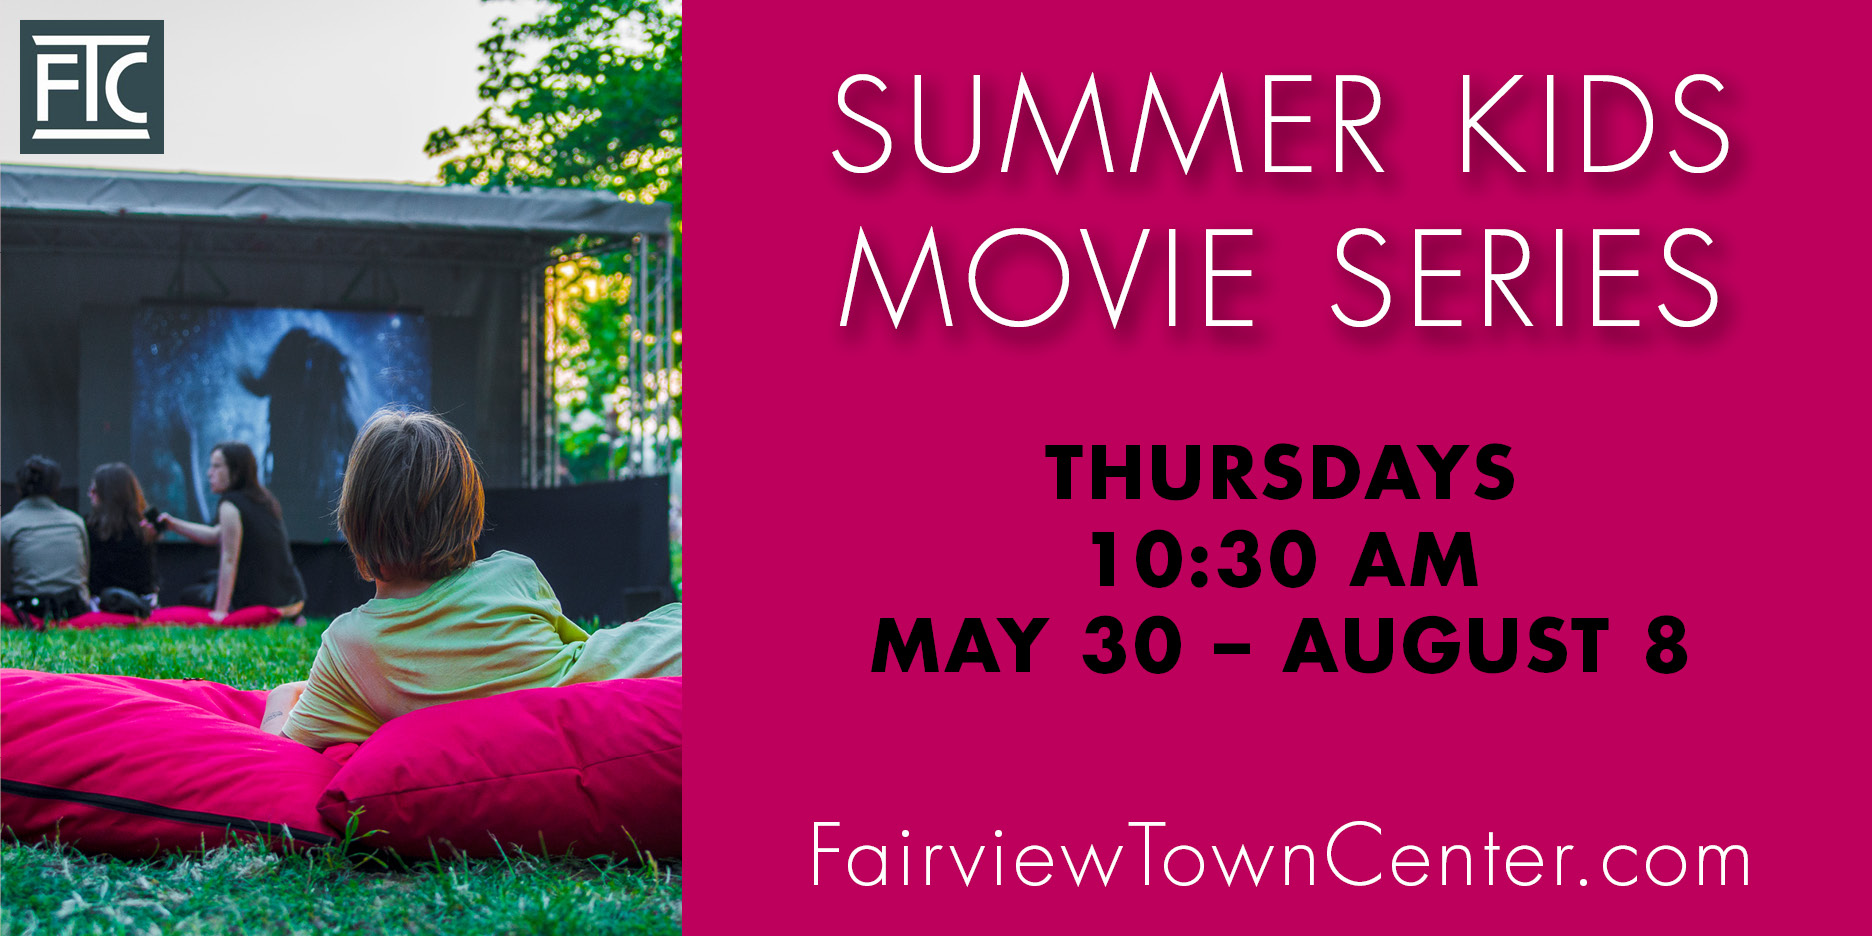 Summer Movies LED Display Ad